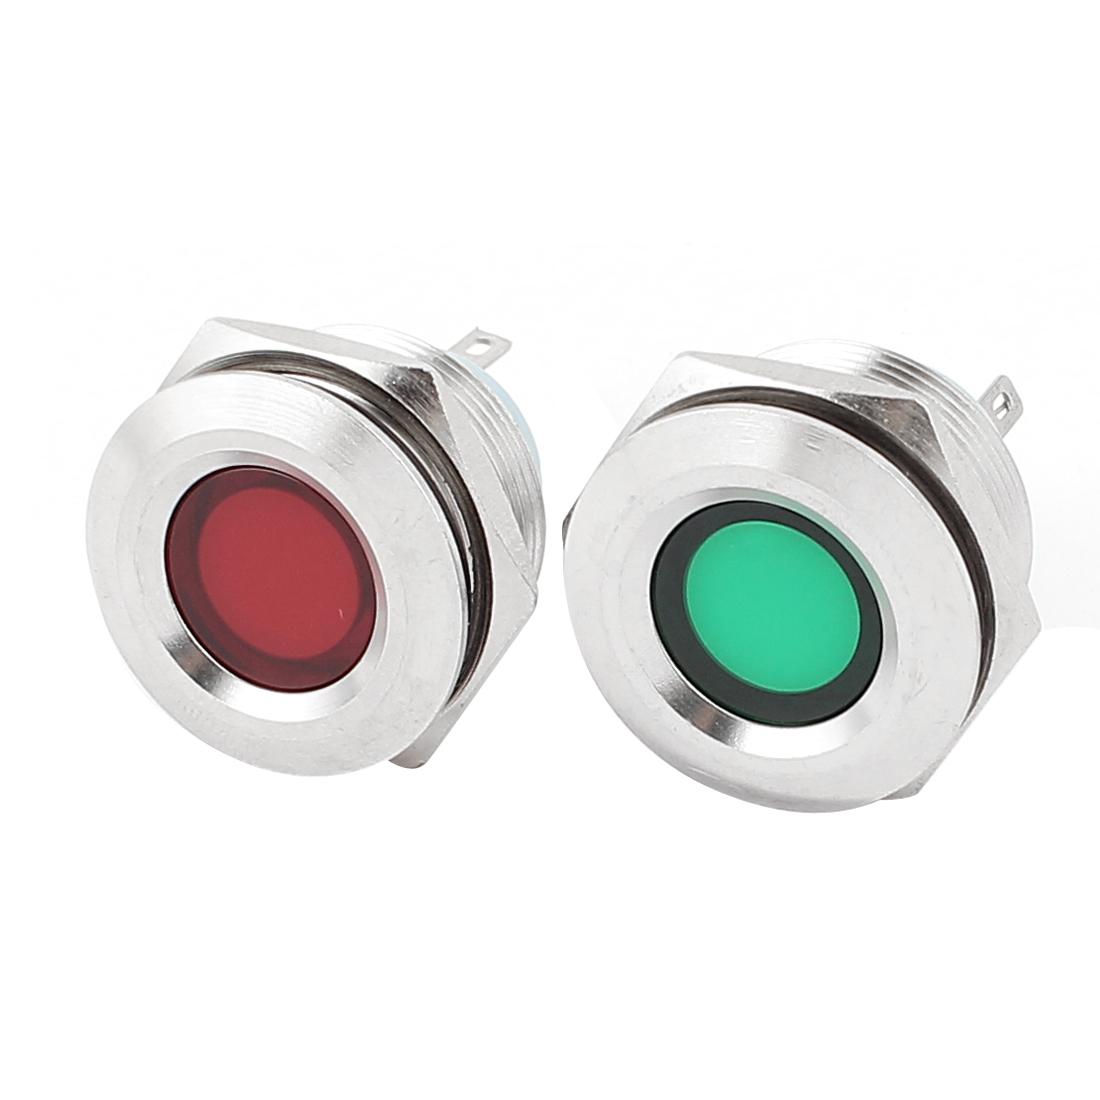 Unique Bargains 2Pcs 22mm Mounted Thread DC 12V Red Green  Indicator Light Set